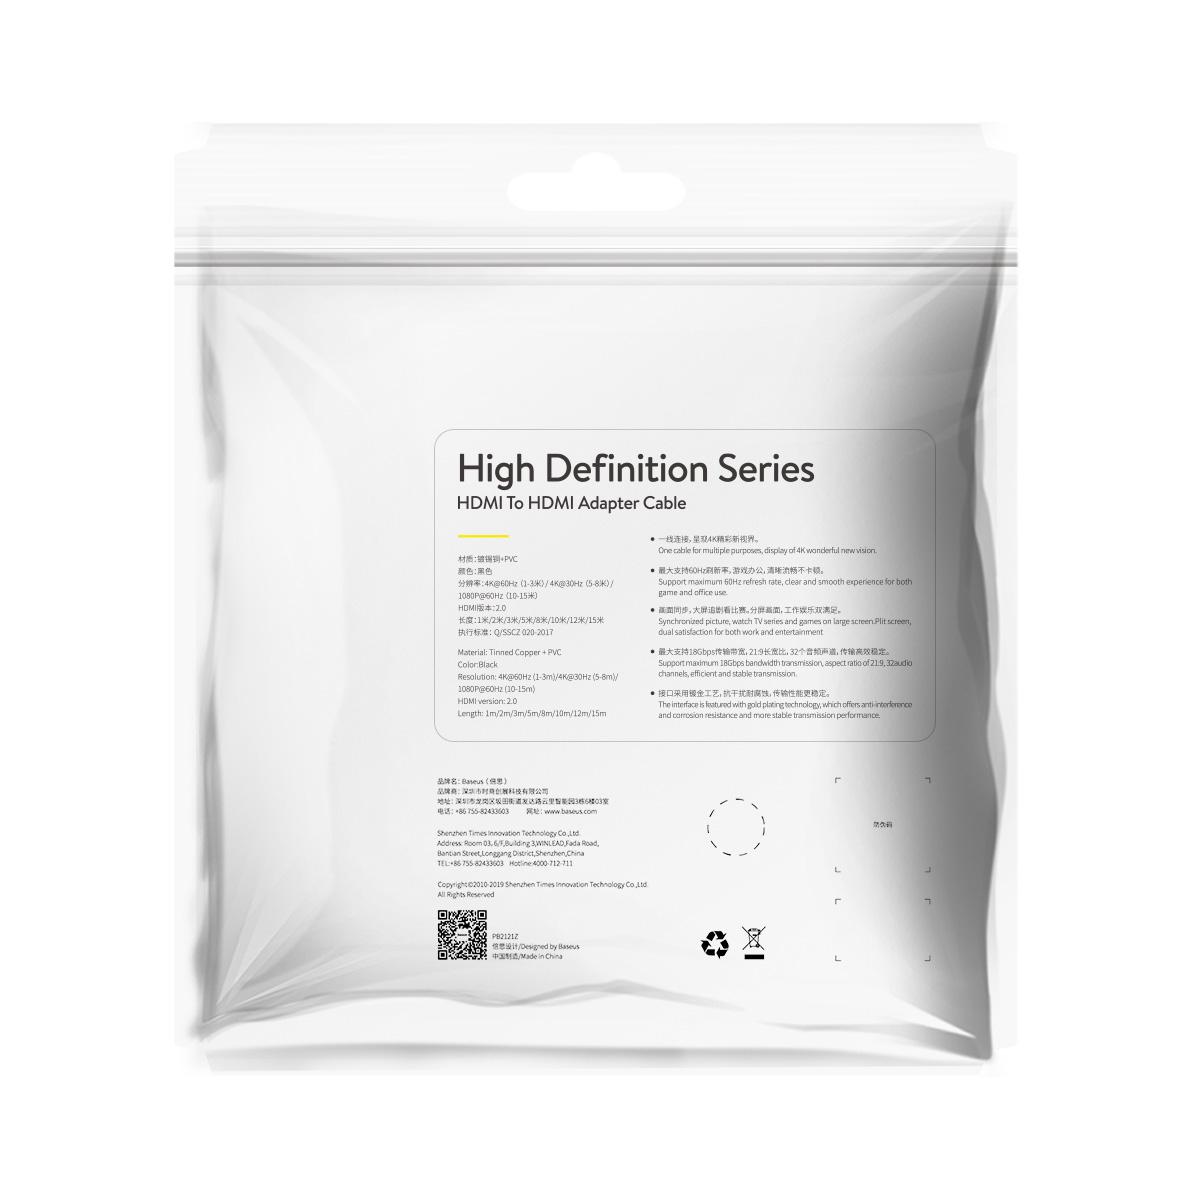 Cabo HDMI Baseus High Definition Series 1m